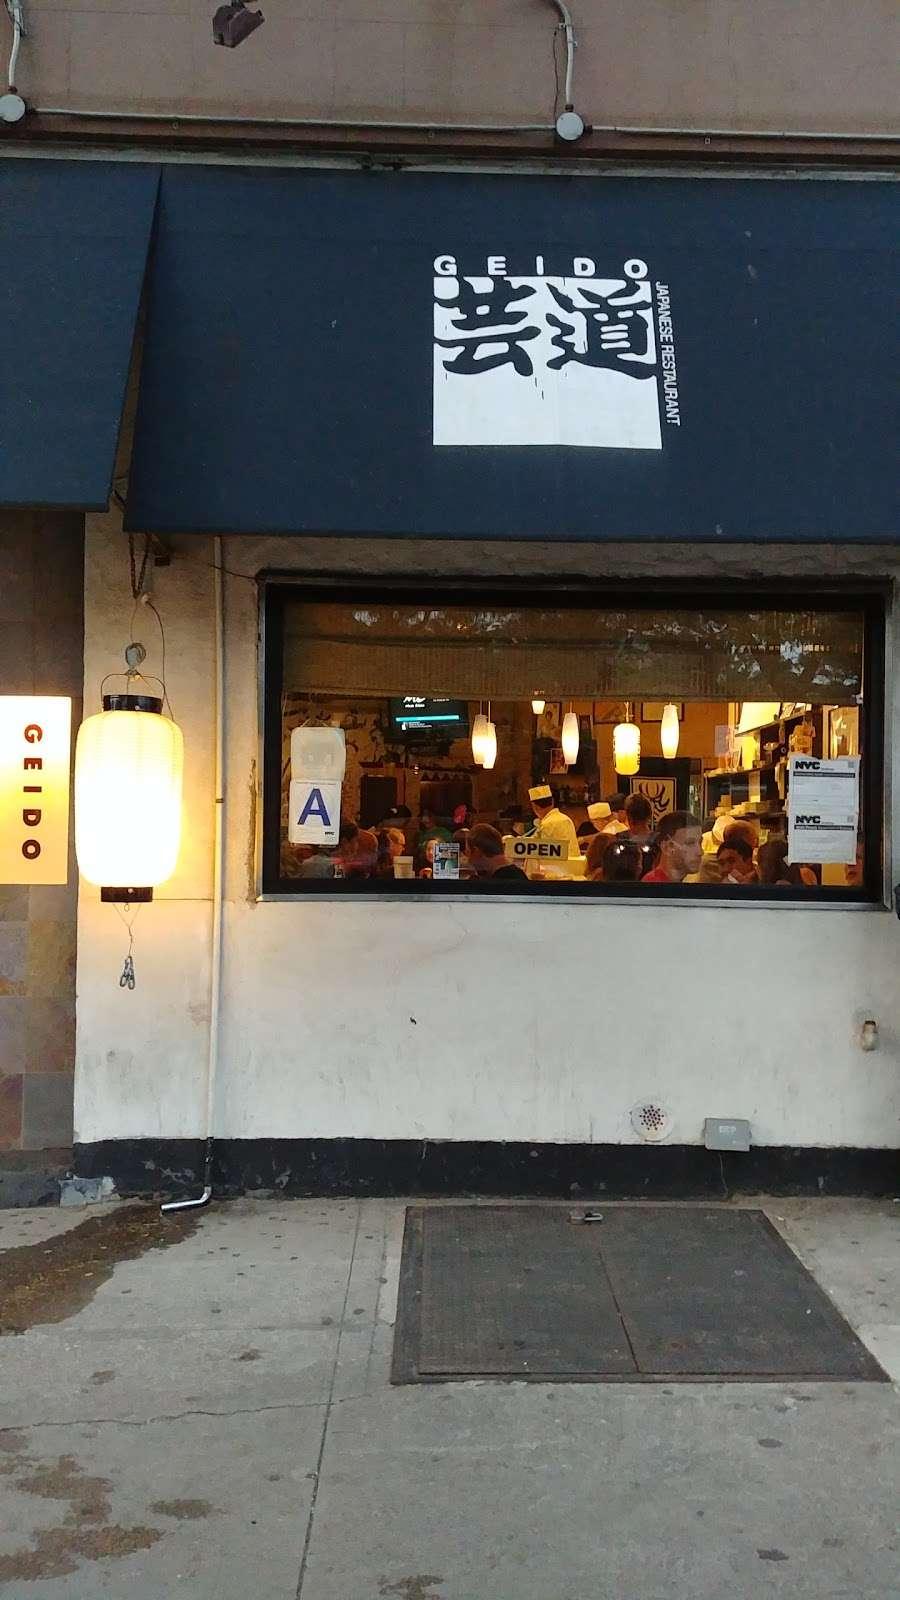 Geido - restaurant  | Photo 2 of 9 | Address: 331 Flatbush Ave, Brooklyn, NY 11217, USA | Phone: (718) 638-8866